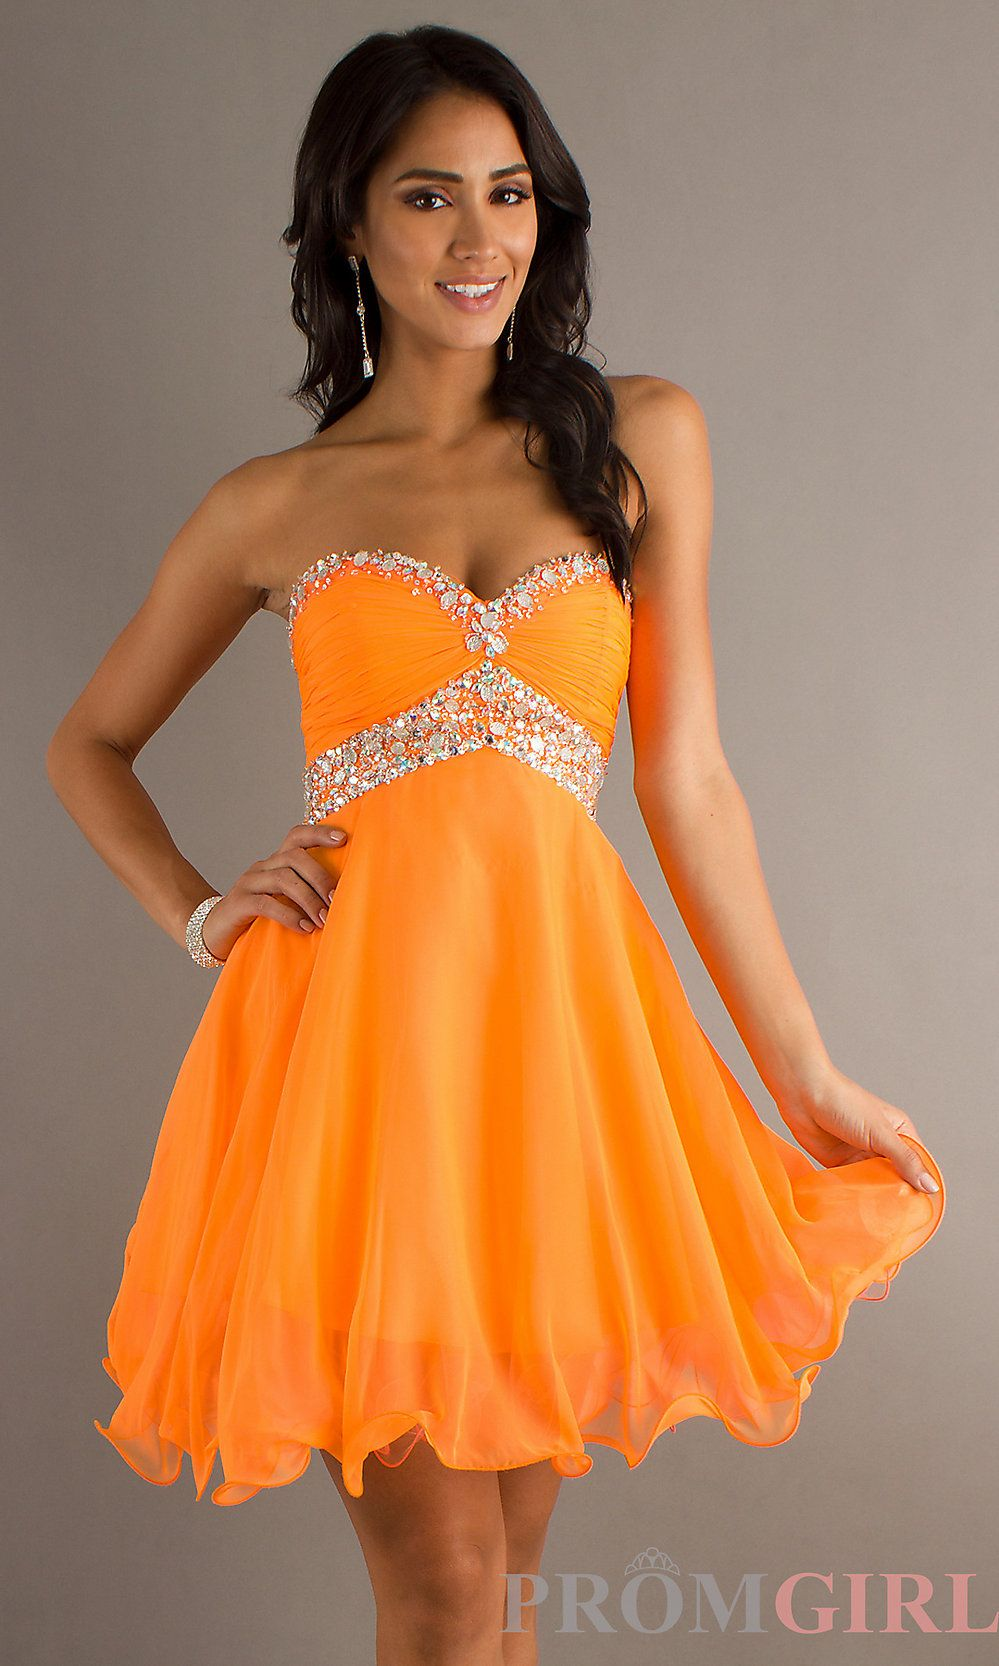 Accessories Short Prom Dresses – Fashion dresses